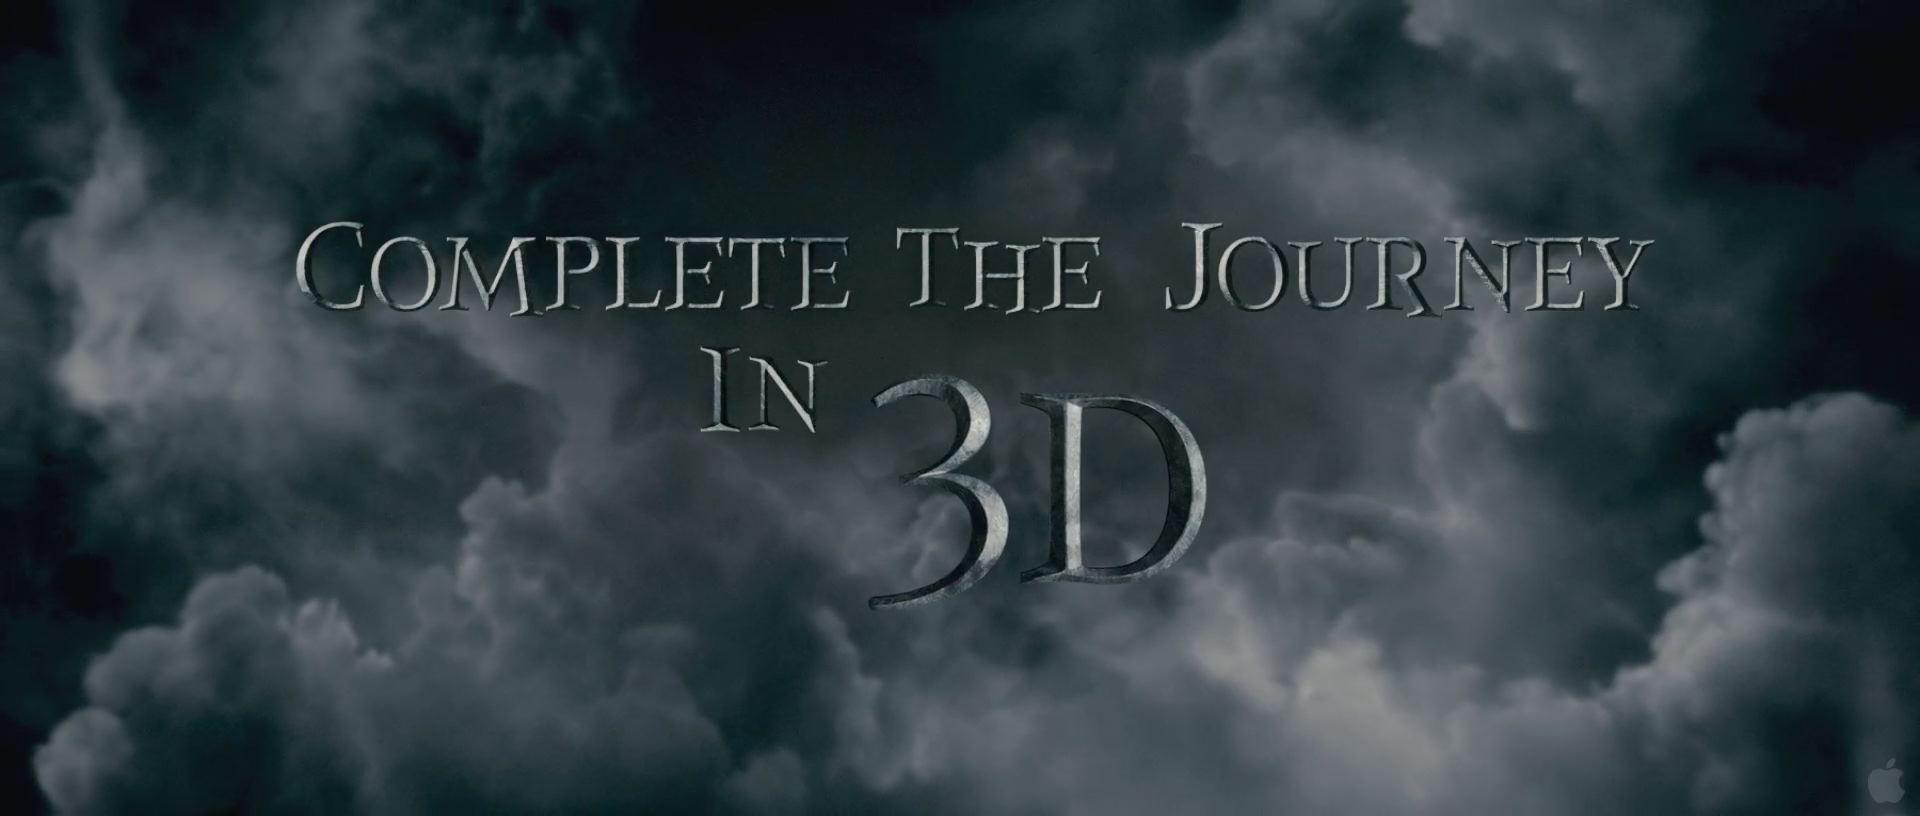 Harry Potter BlogHogwarts HP7 2 Trailer 94